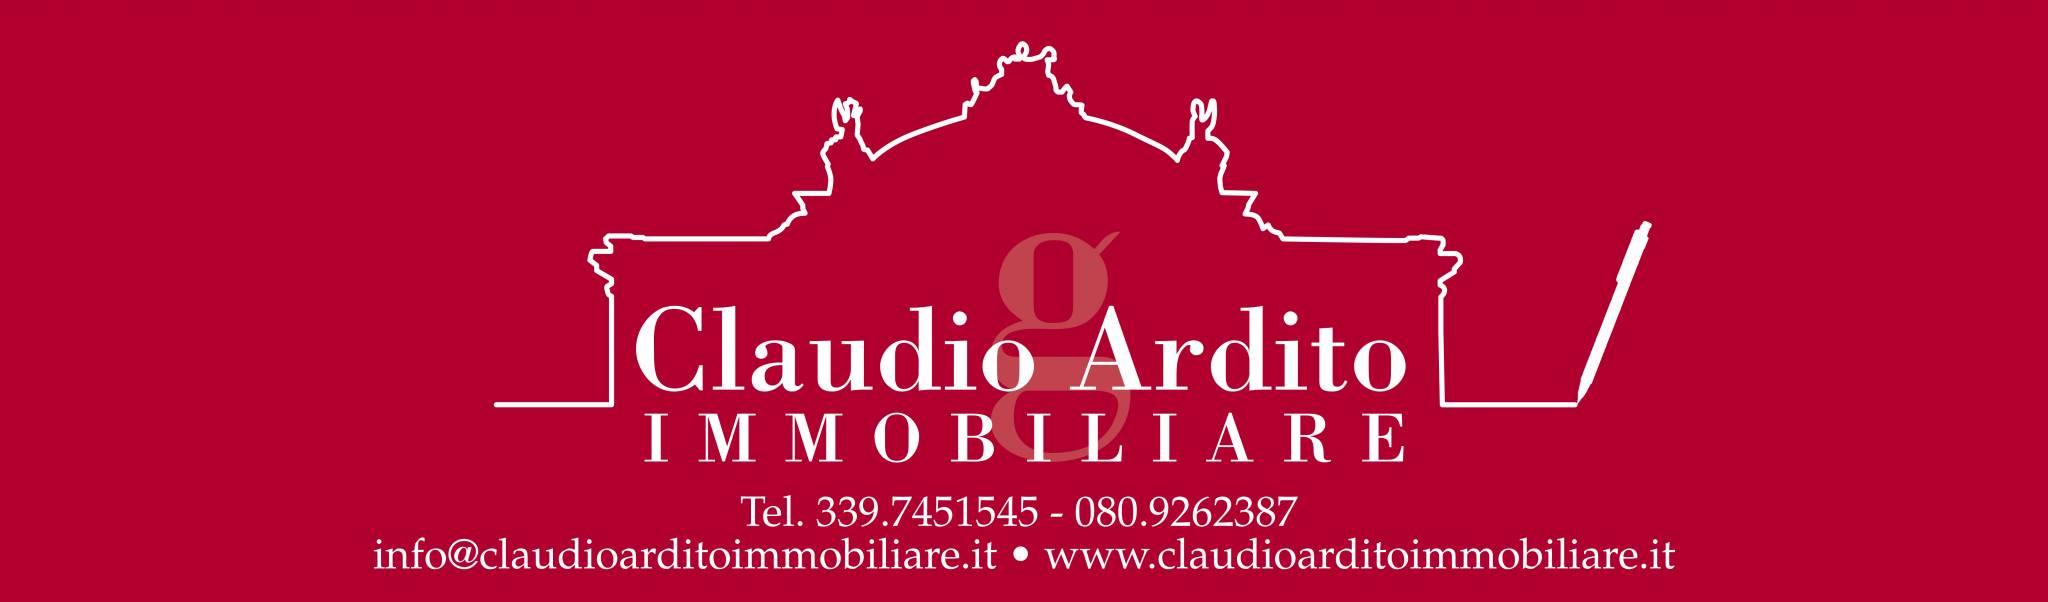 Claudio Ardito Immobiliare